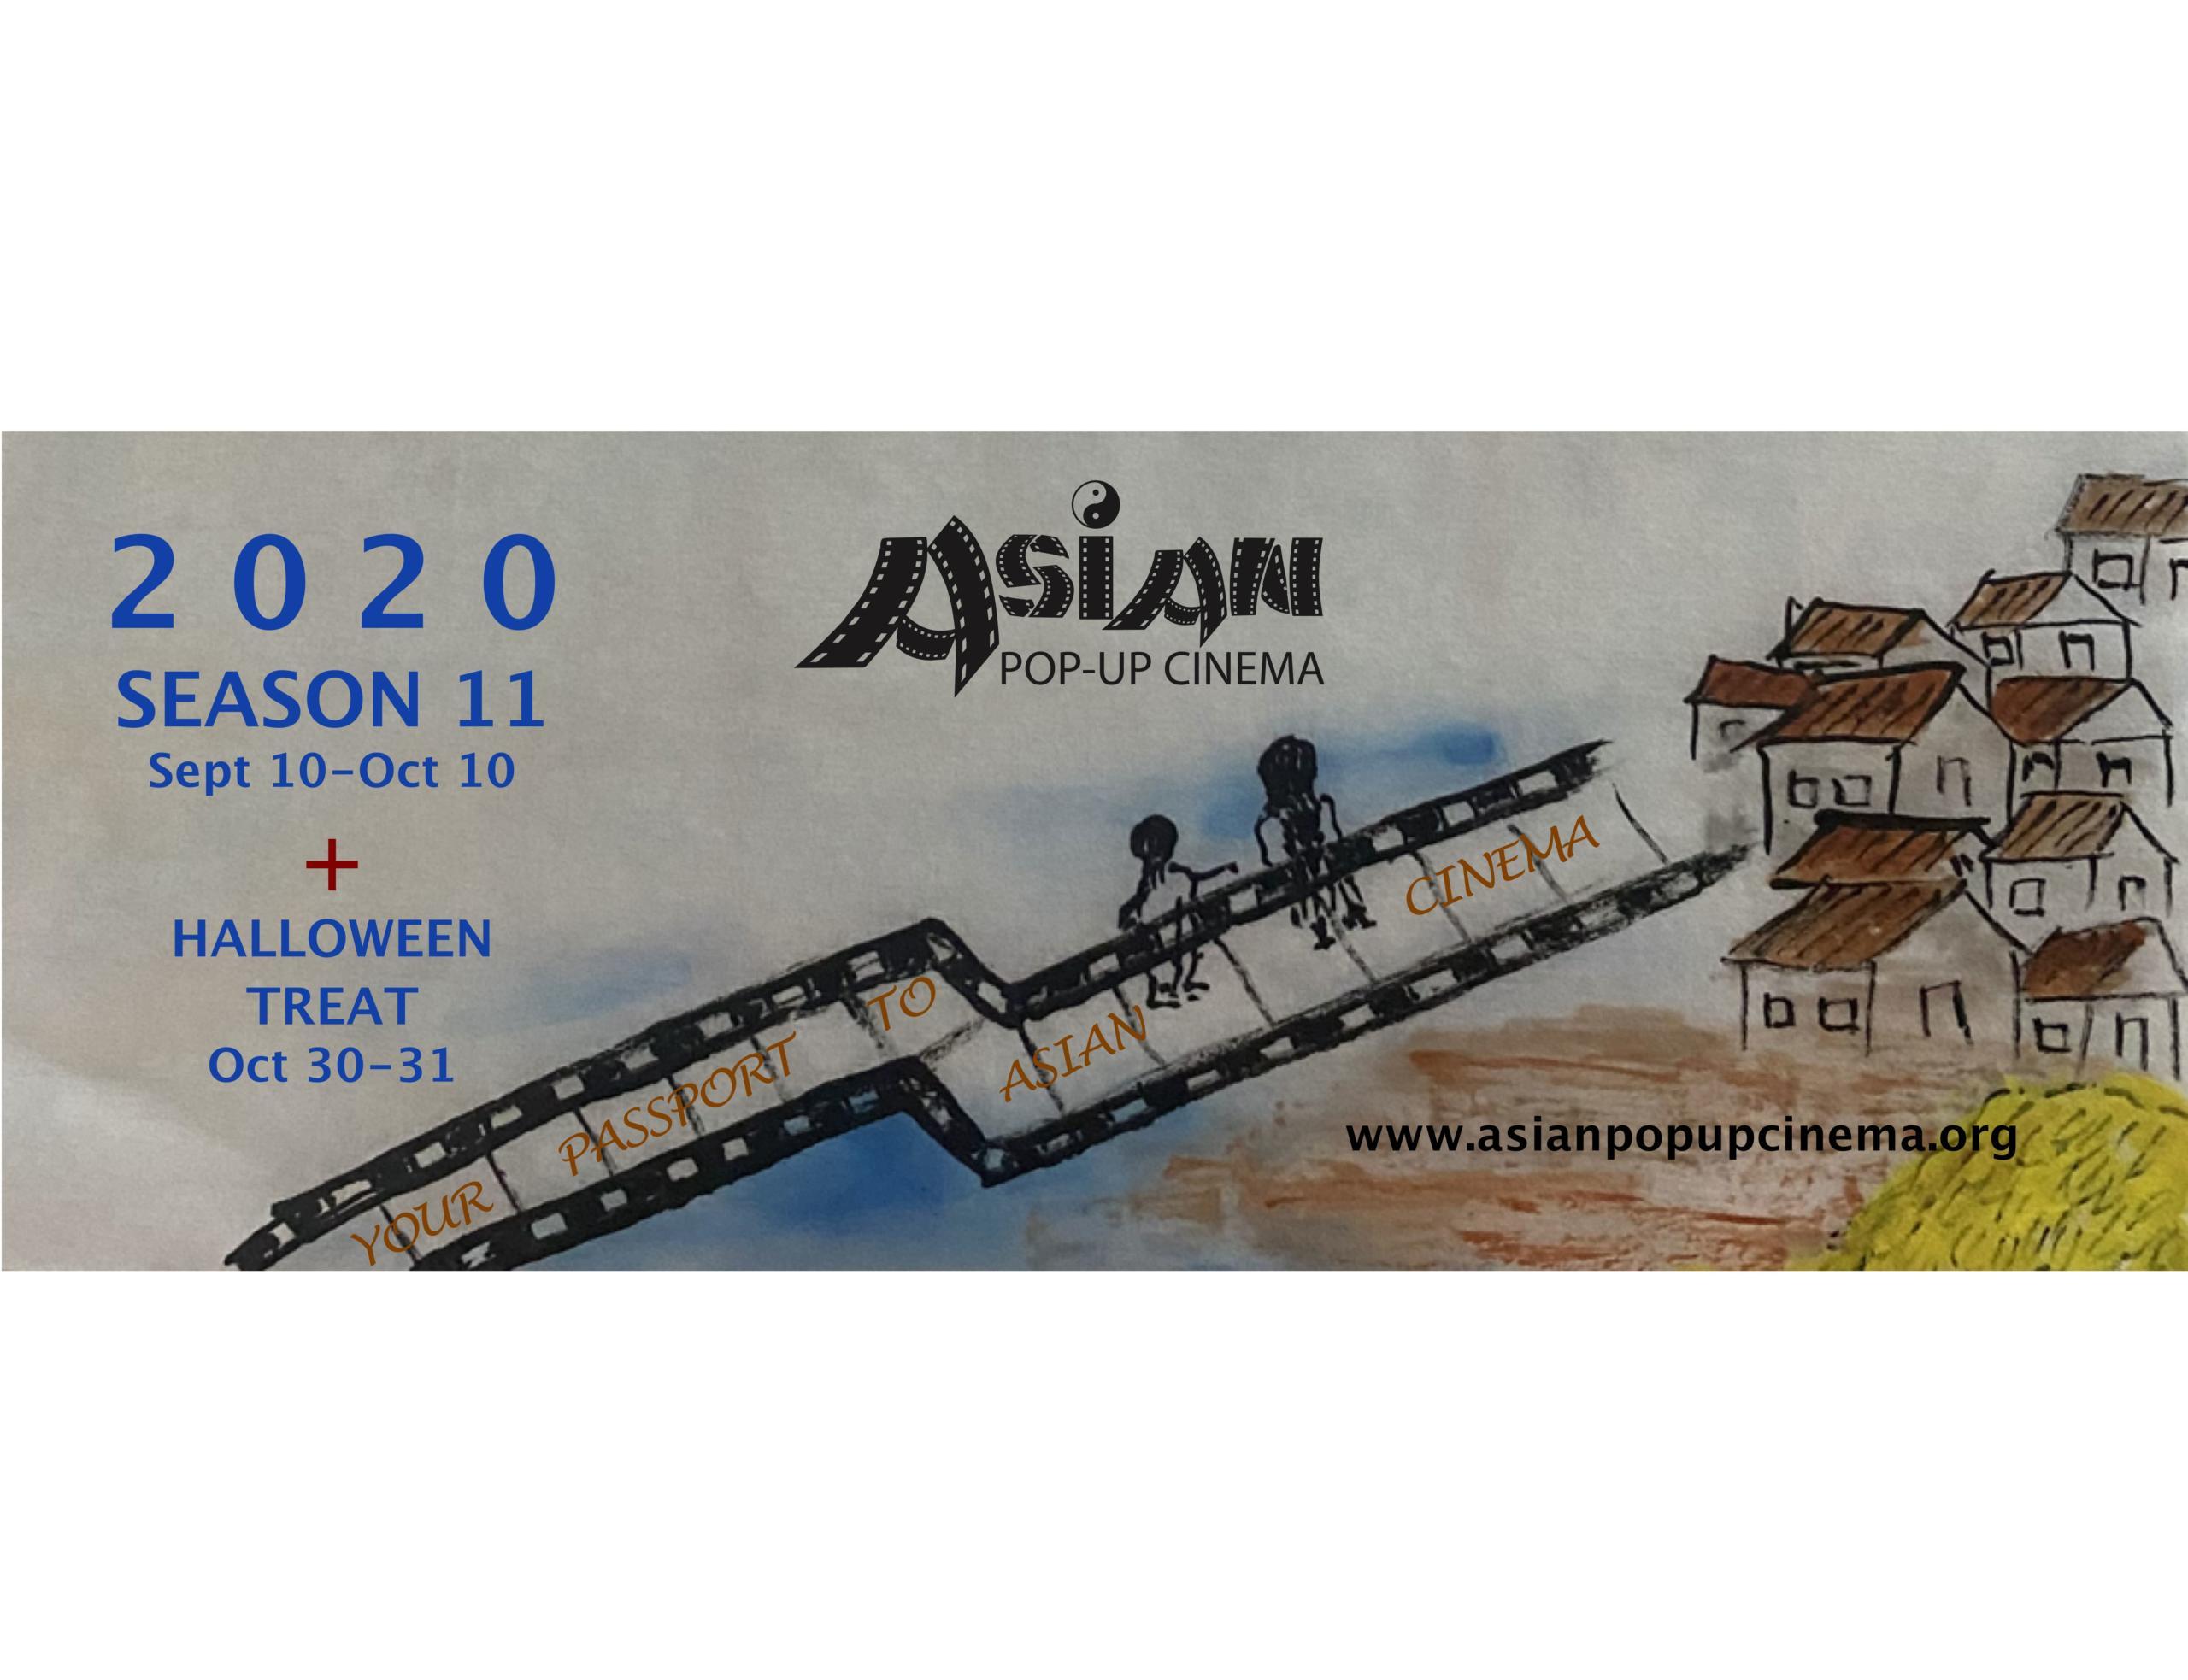 Asian Pop-Up Cinema – Season 11 & PLUS (Film Festival)